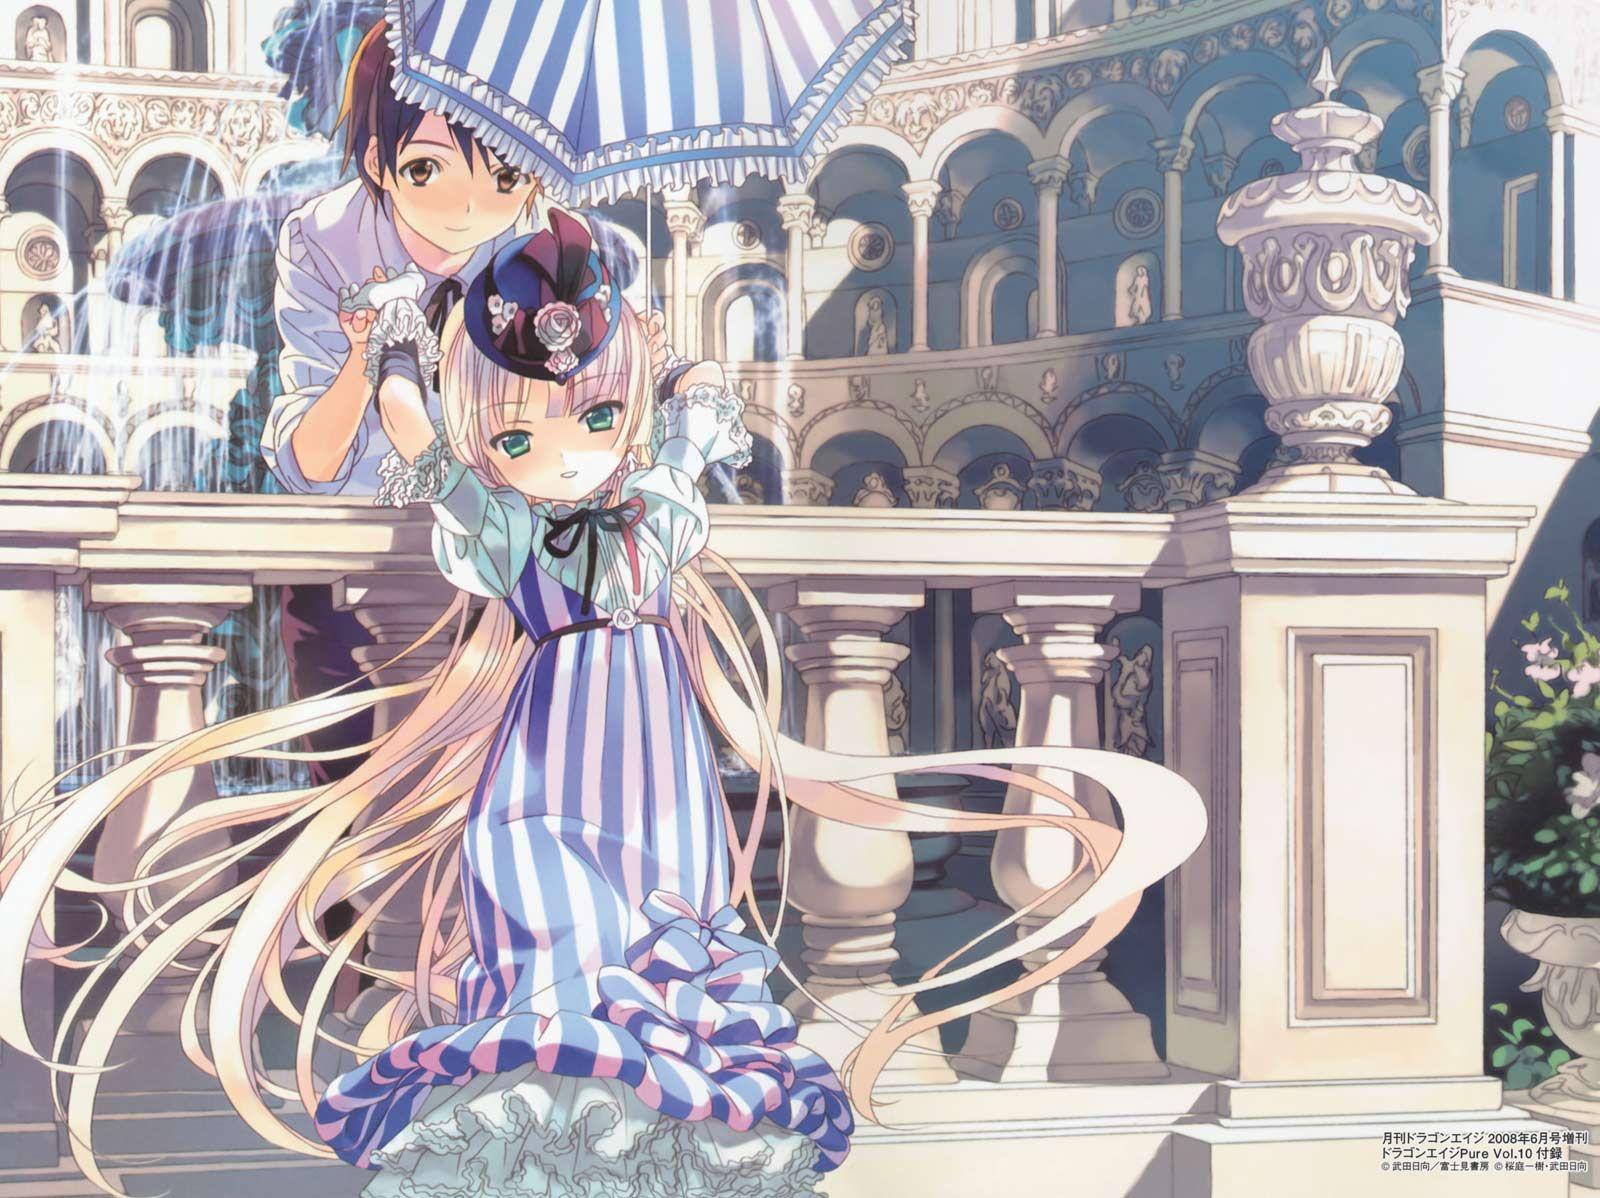 moe23379fixedgosickloli.jpg 1,600×1,198ピクセル Anime